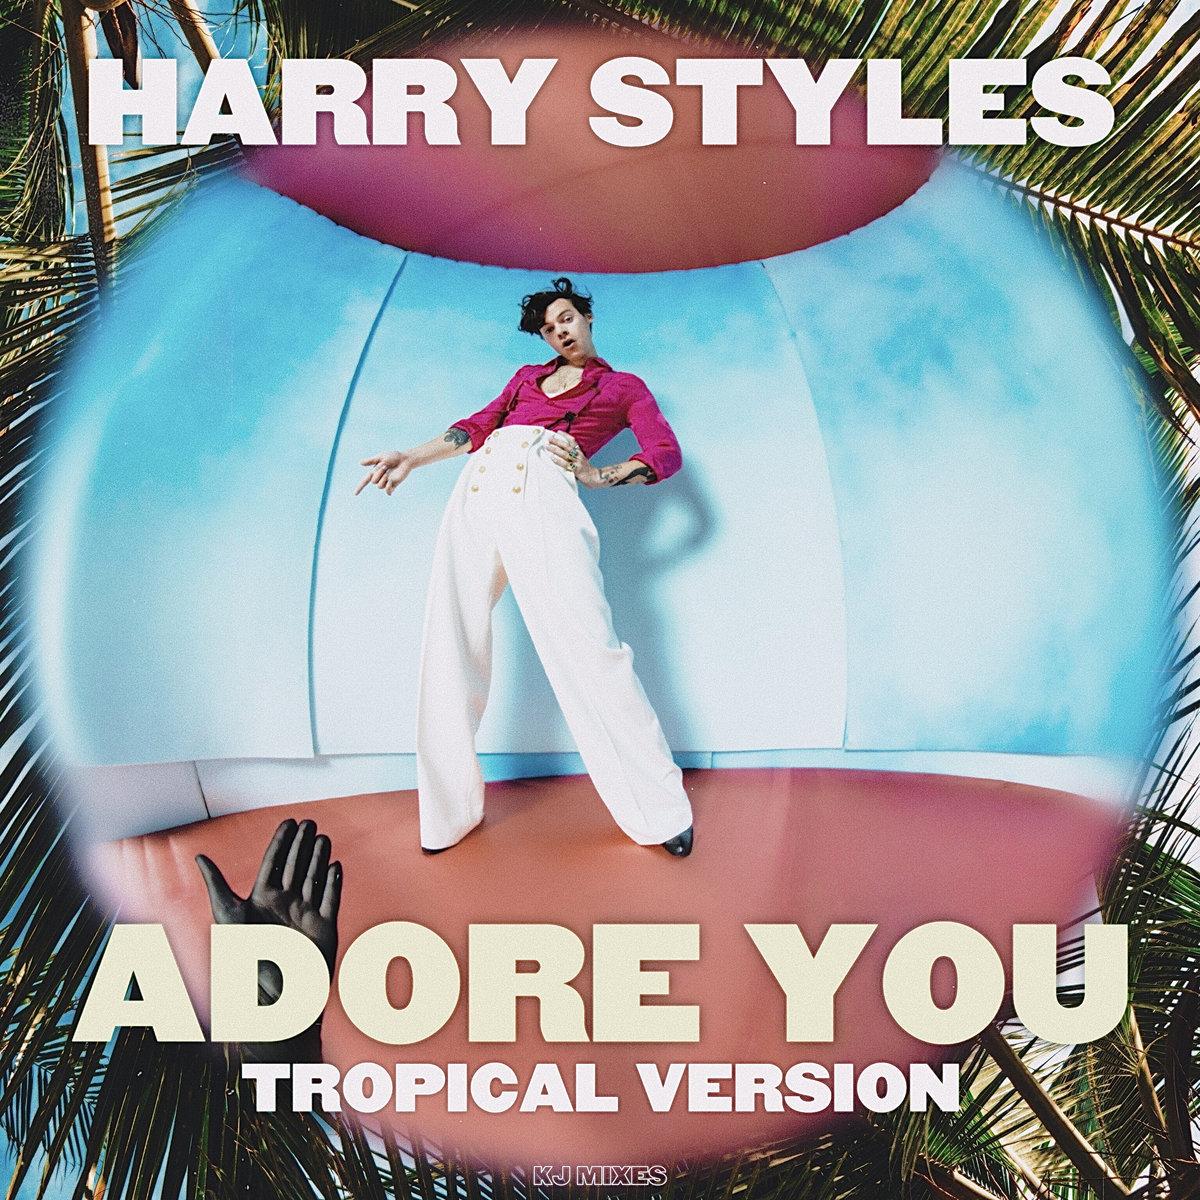 Harry Styles Adore You Tropical Version Kj Mixes